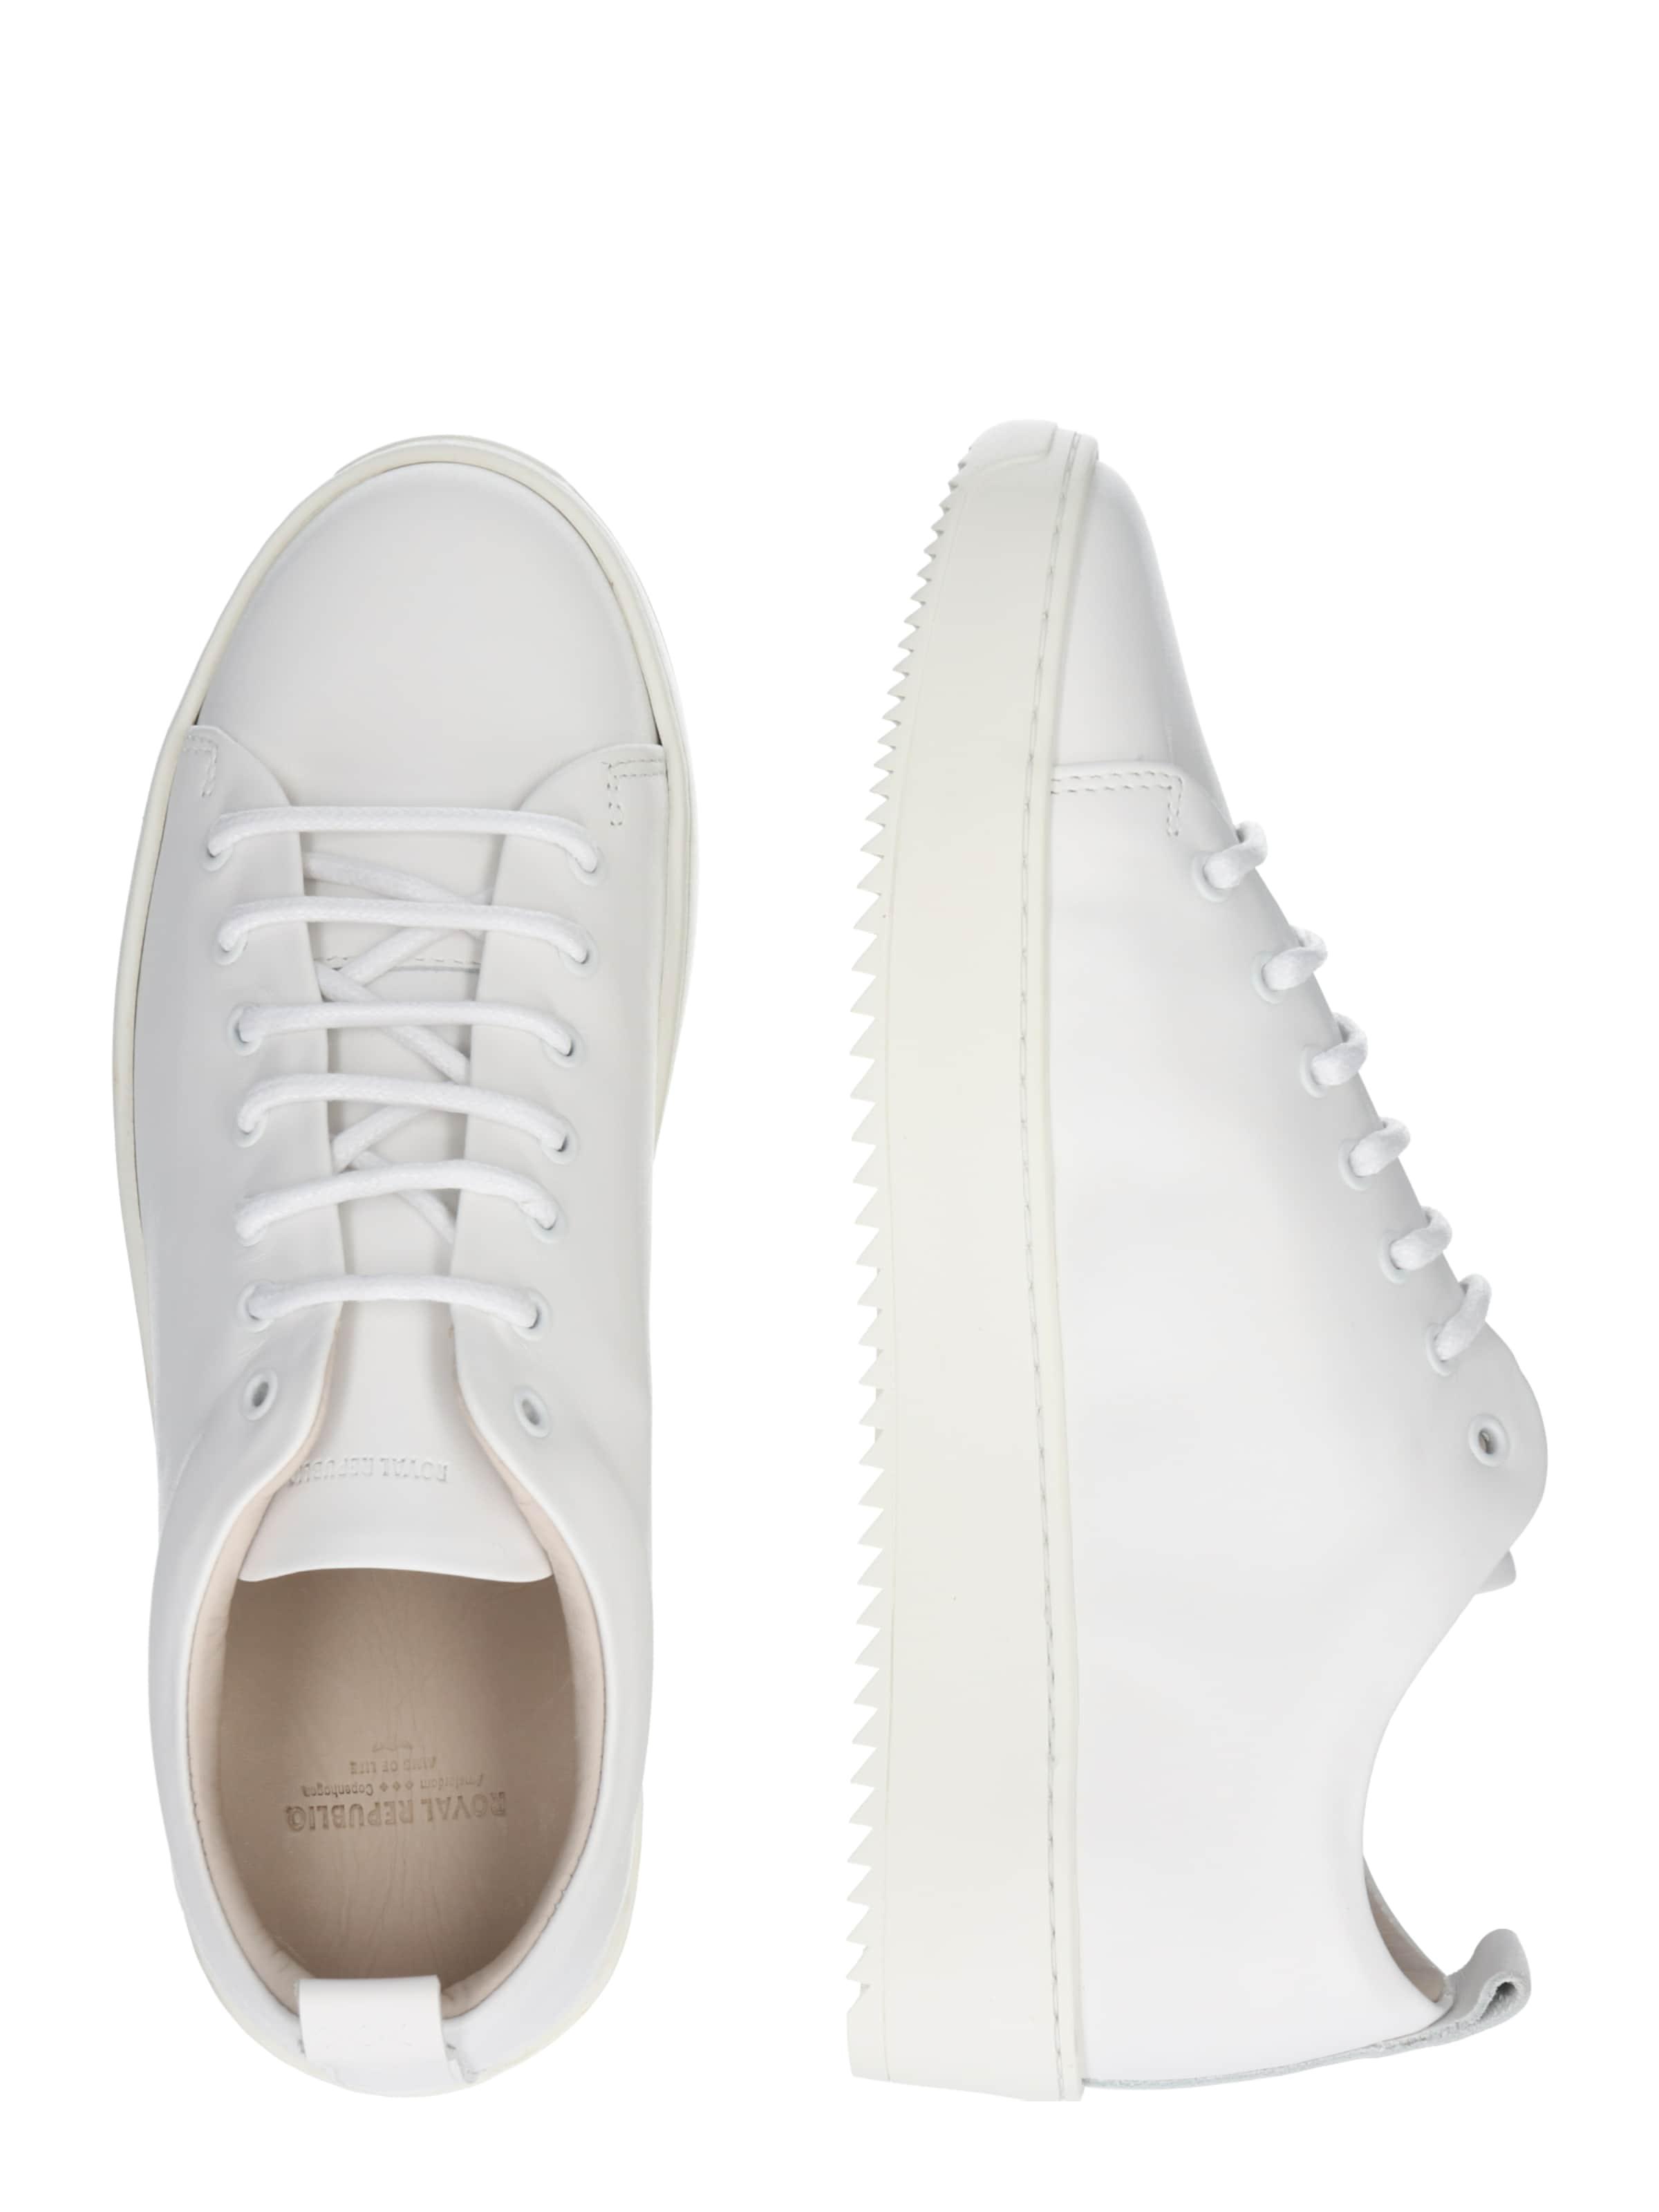 'bolt Royal In Derby' Weiß Sneaker Republiq Tlc3JF1K